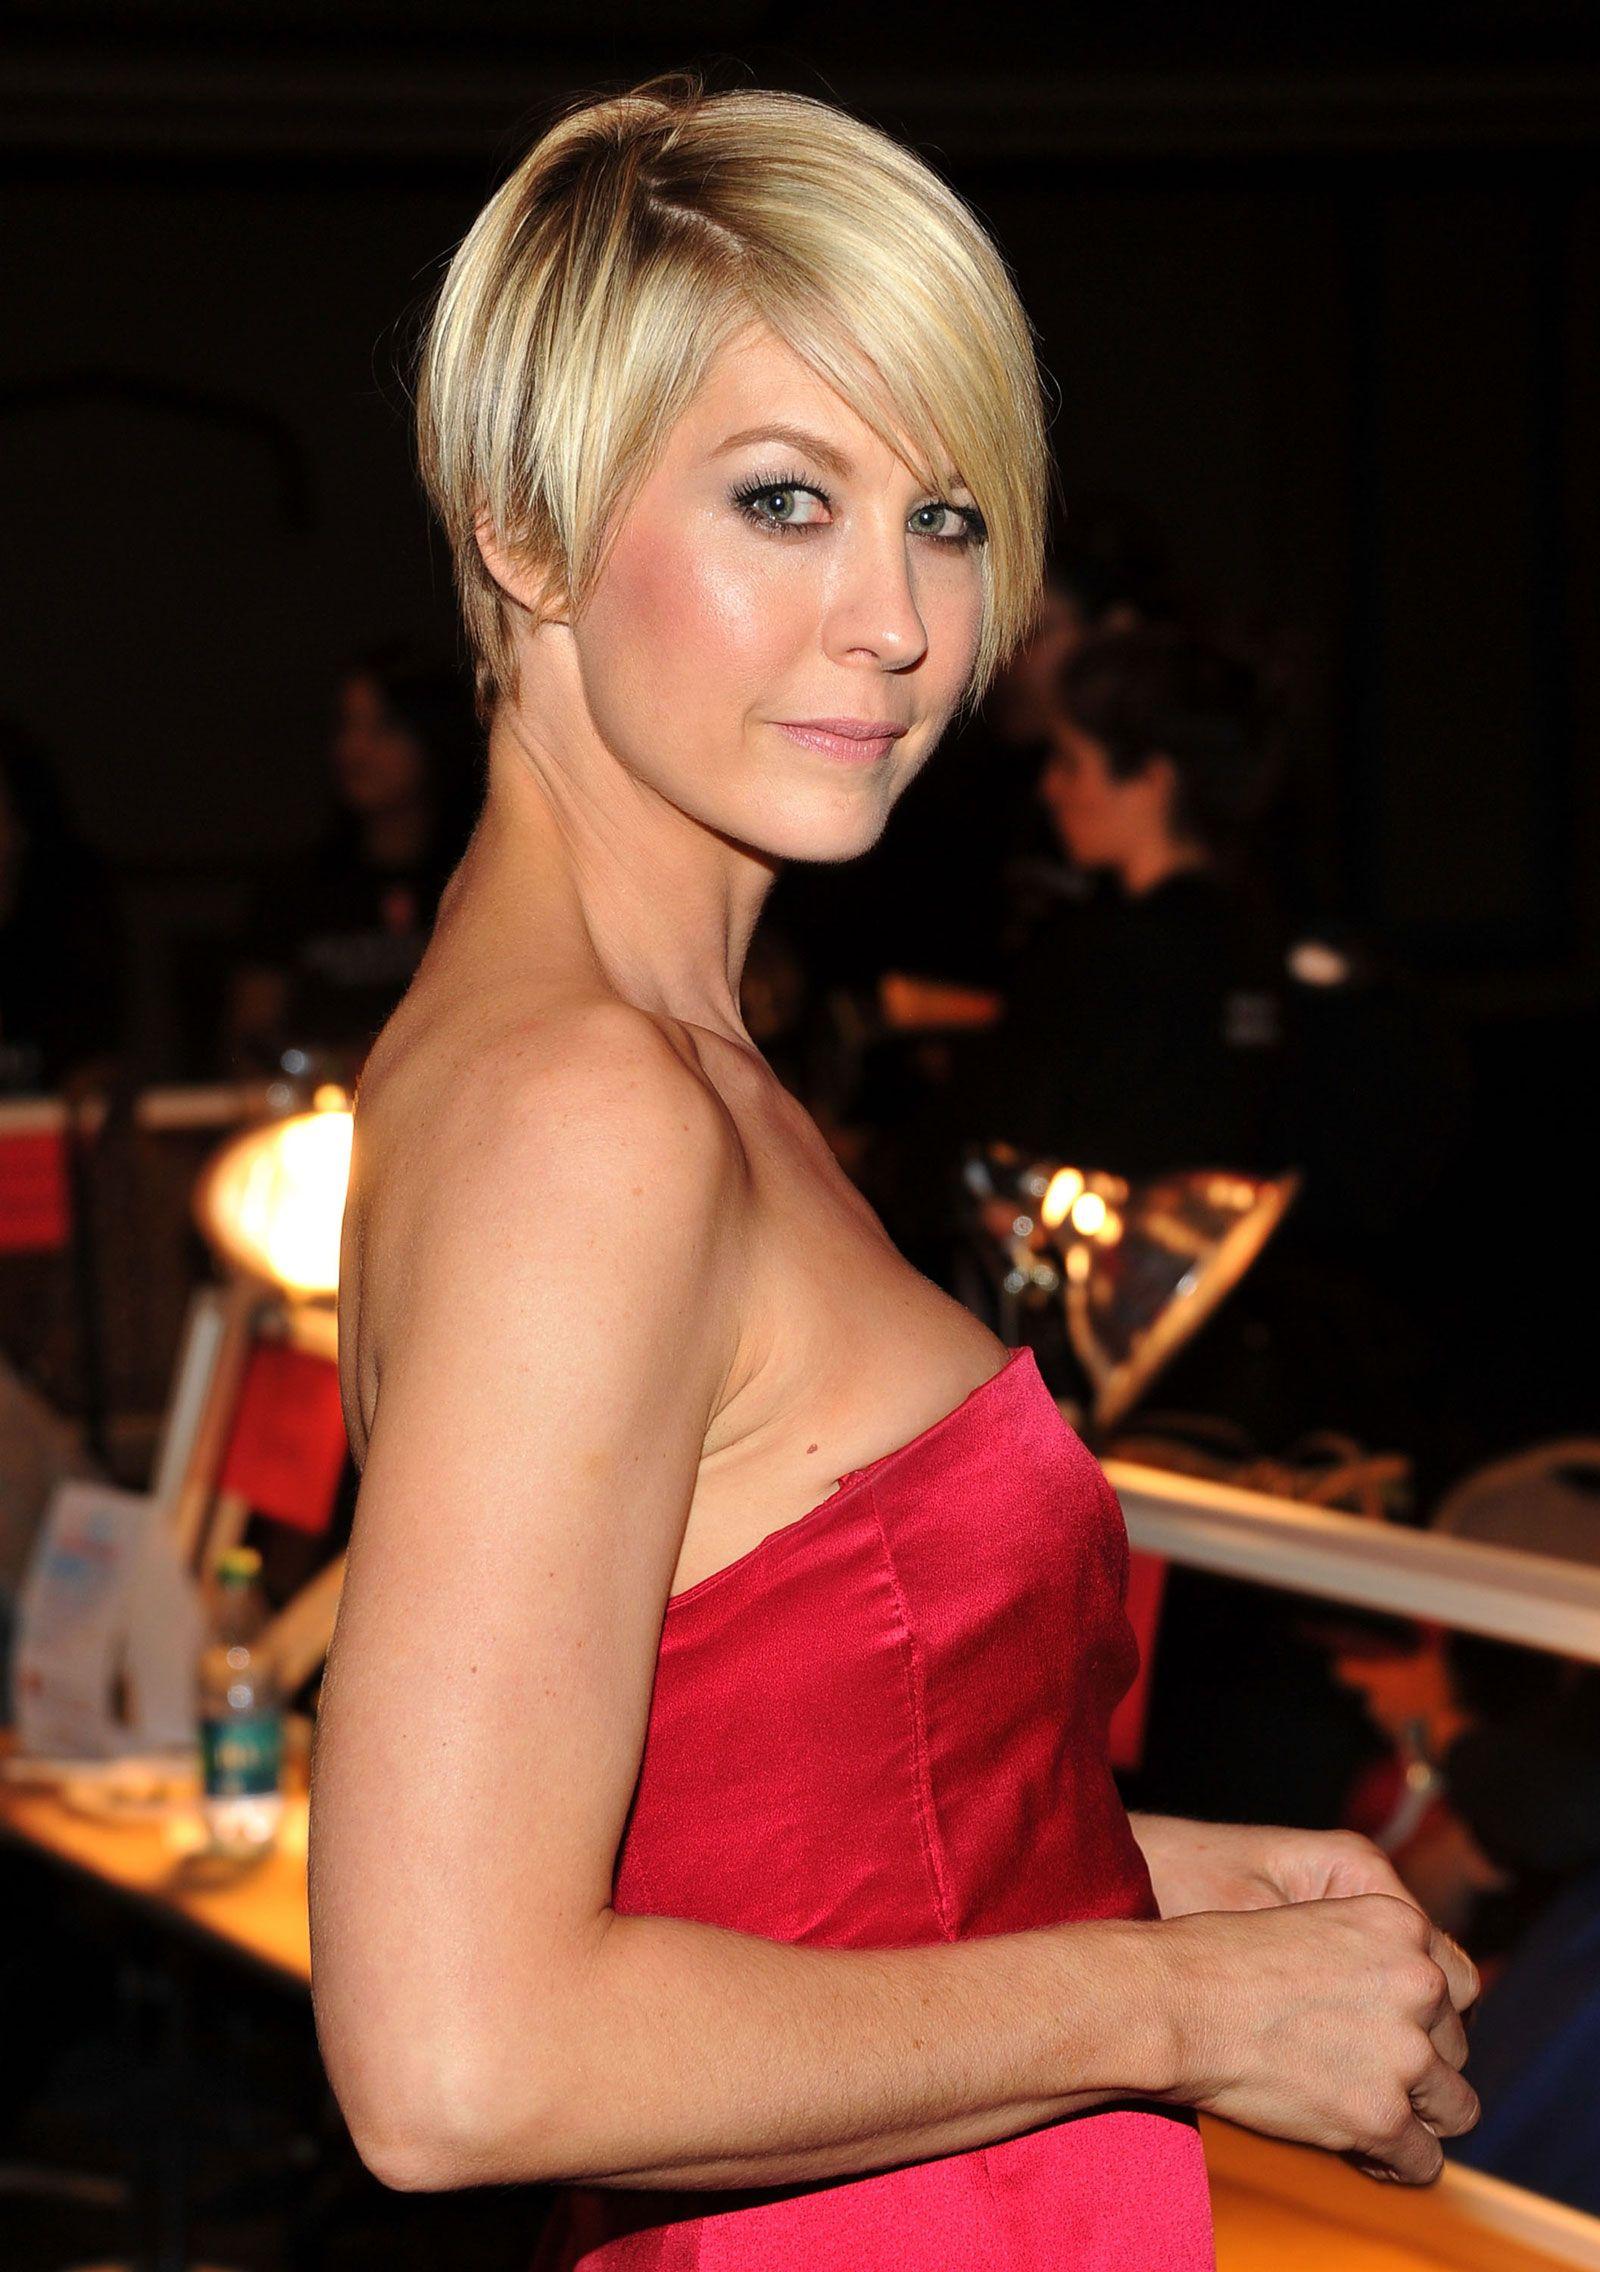 Jenna elfman photos photos the heart truthus red dress collection